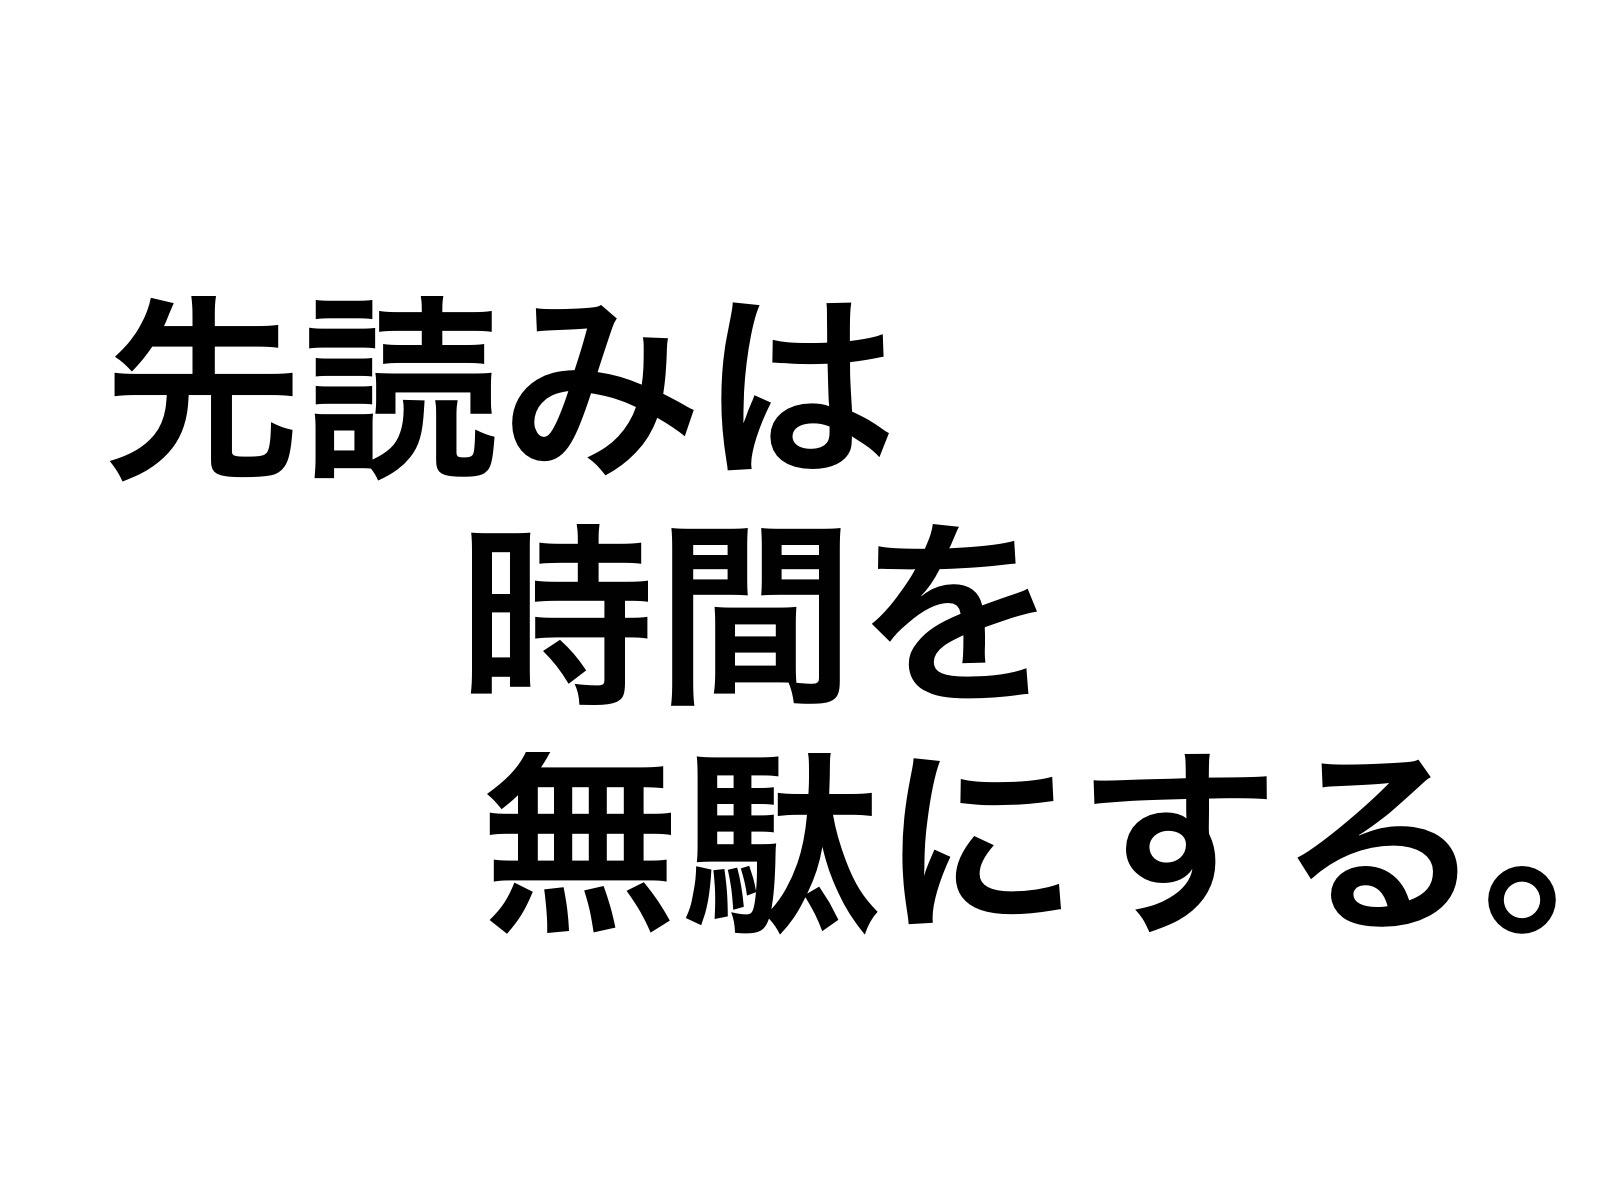 2016 08 13 15 07 02